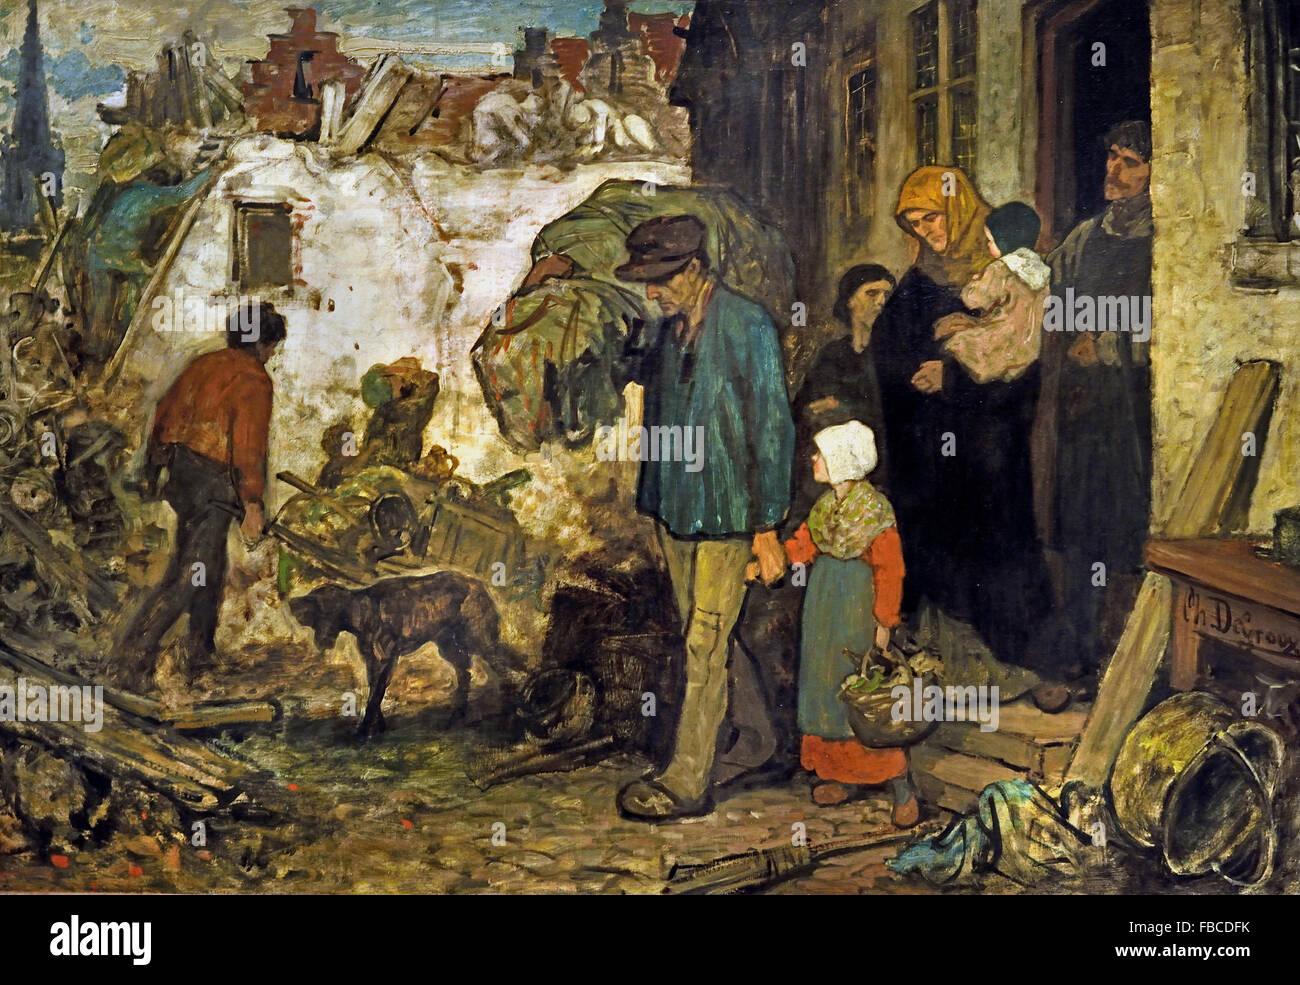 The Expulsion by Charles de Groux 1825-1870 Flemish Belgian Belgium - Stock Image